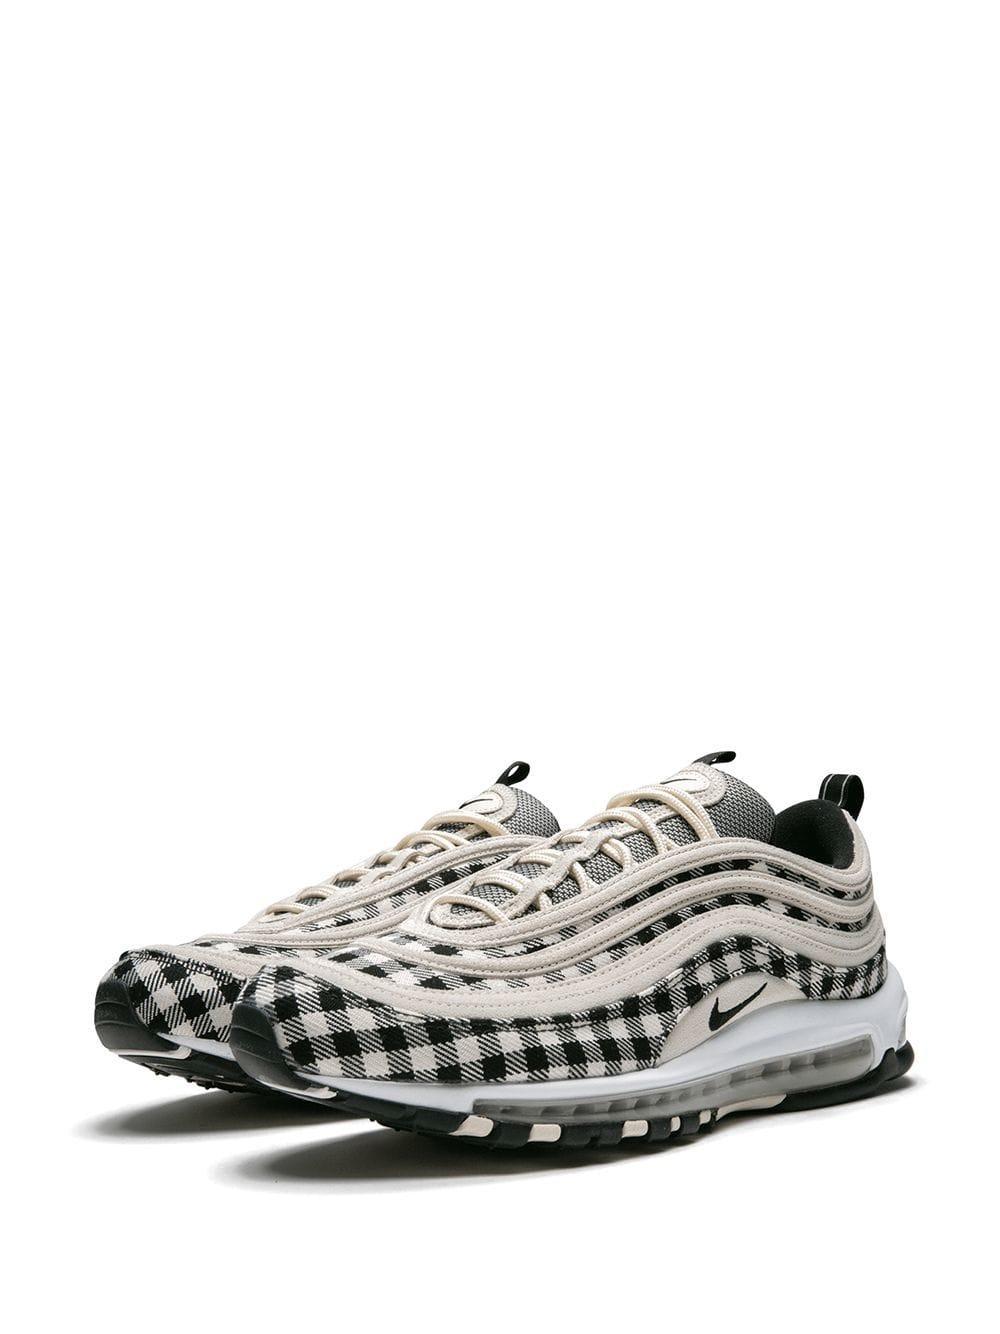 09841dfb6b Lyst - Nike Air Max 97 Premium Sneakers in White for Men